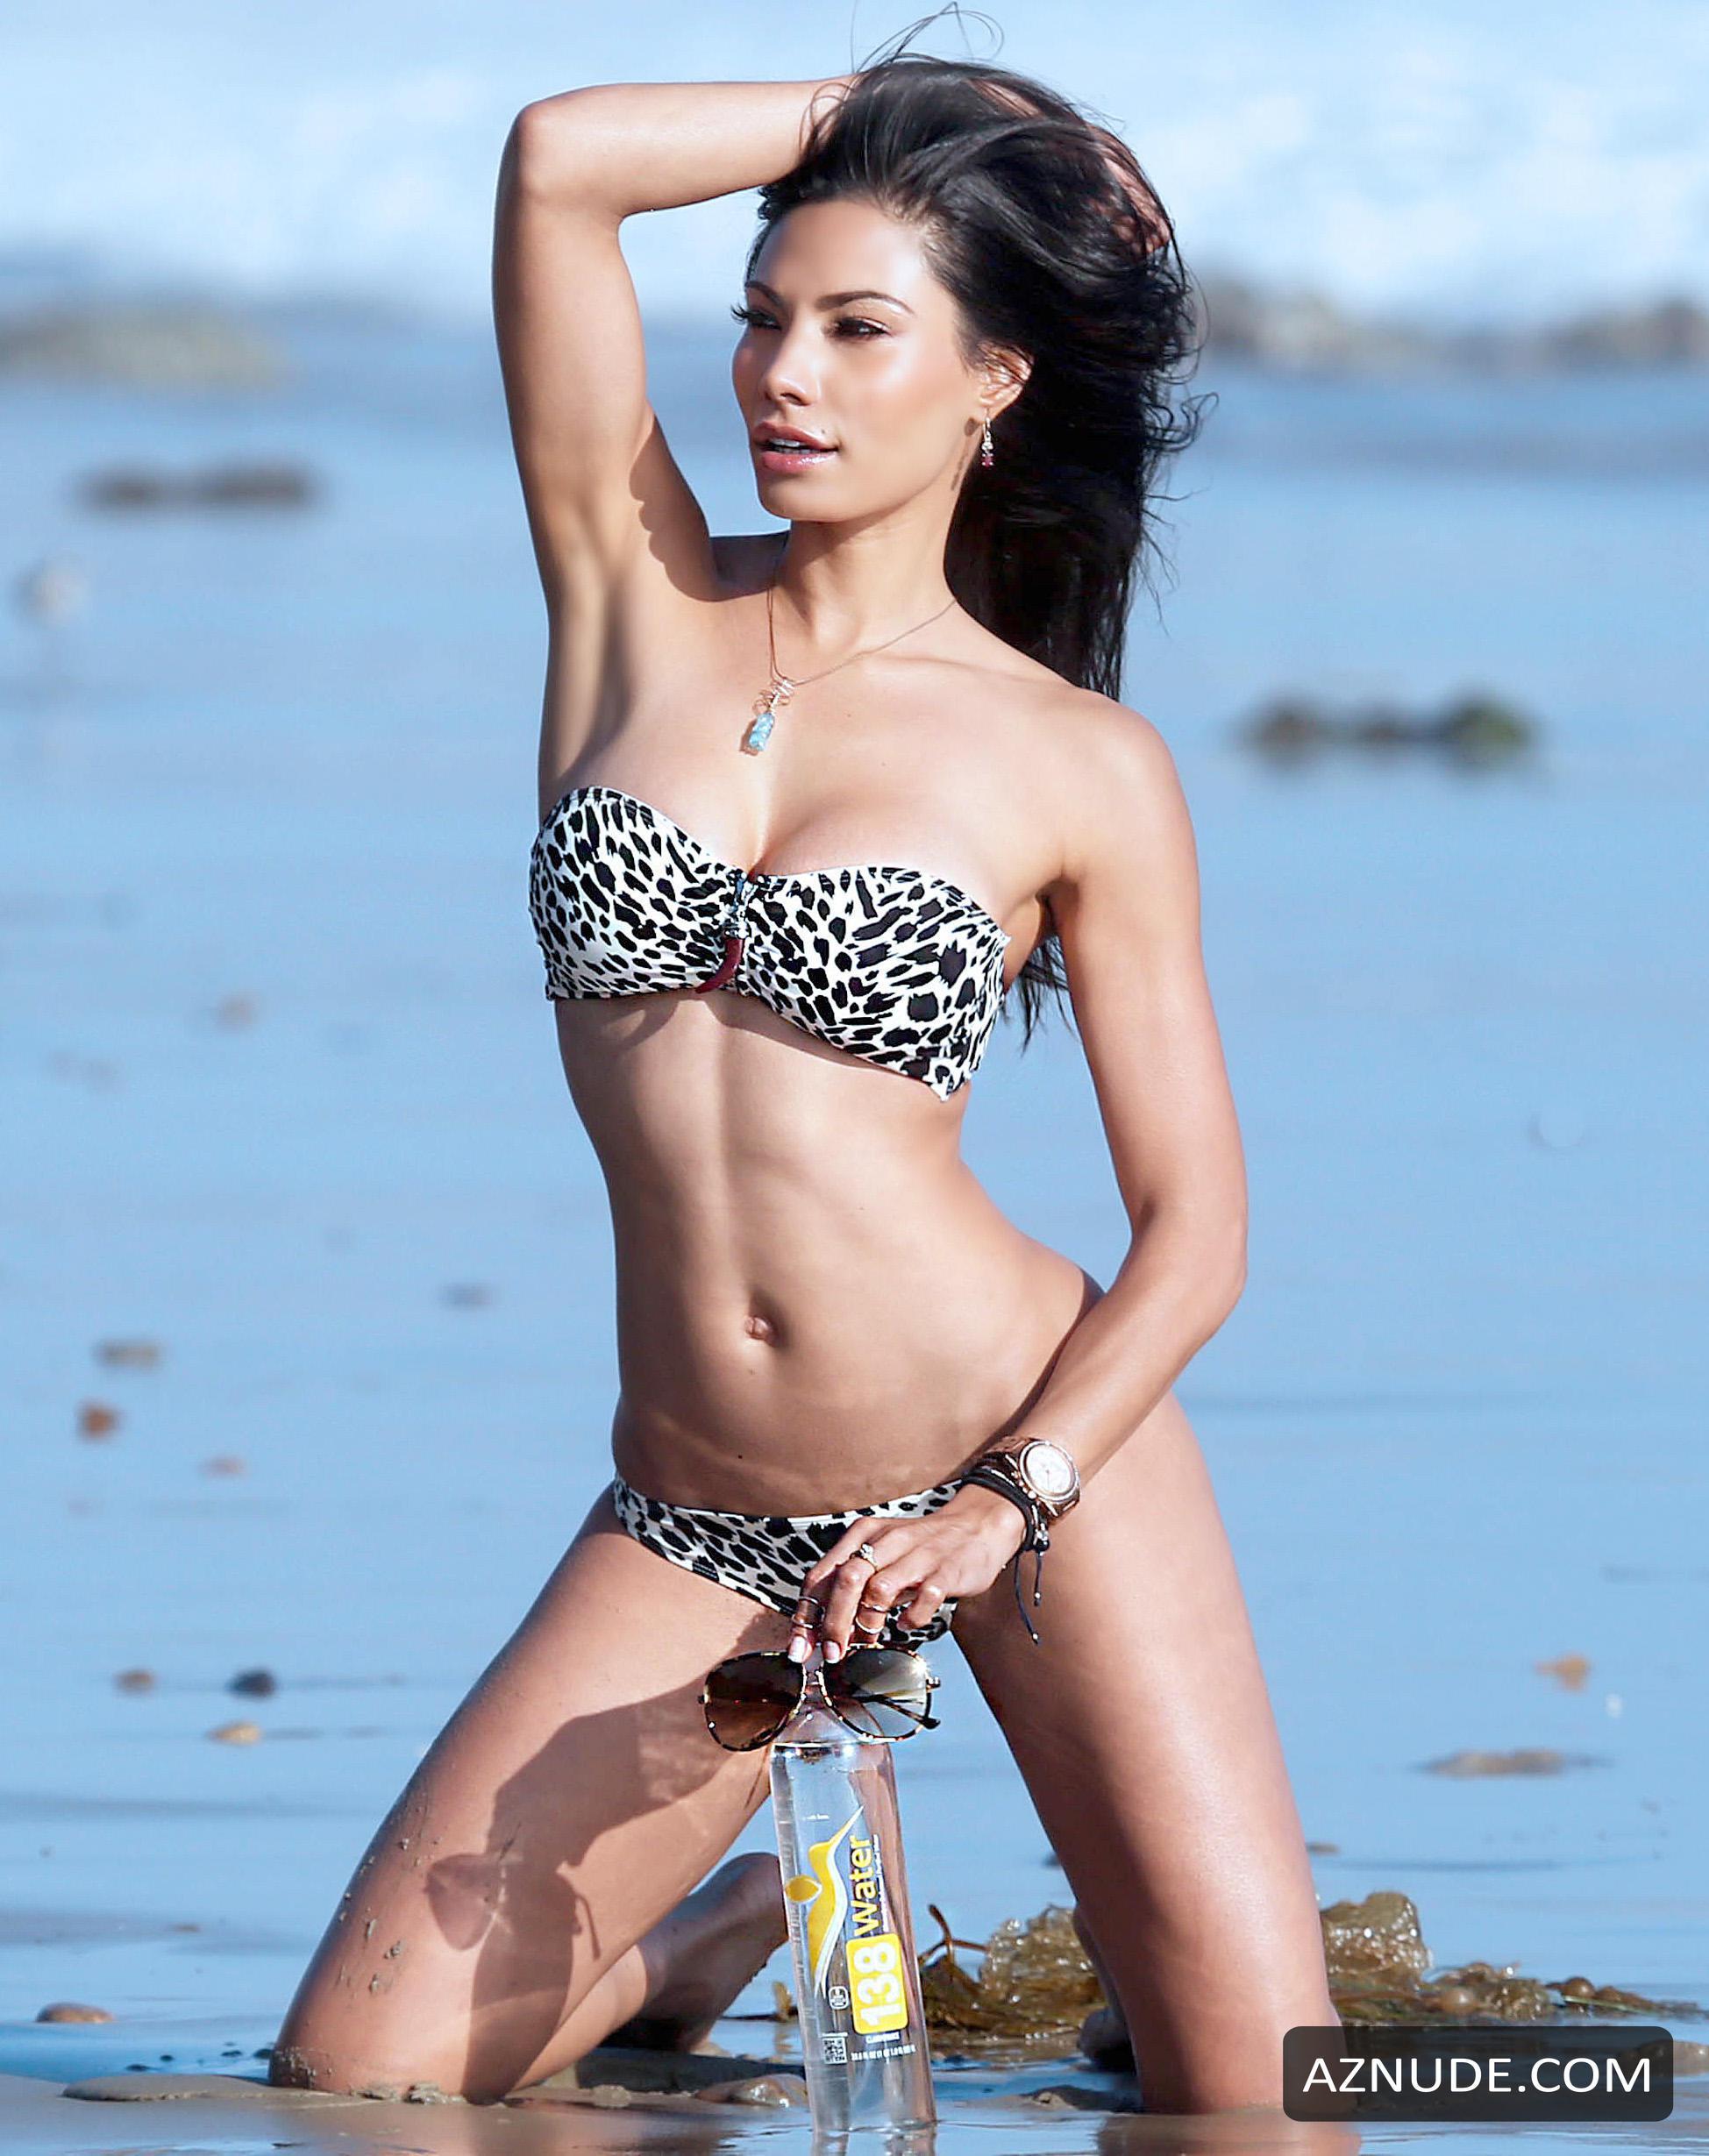 Nikki nackt Nixx 41 Sexiest